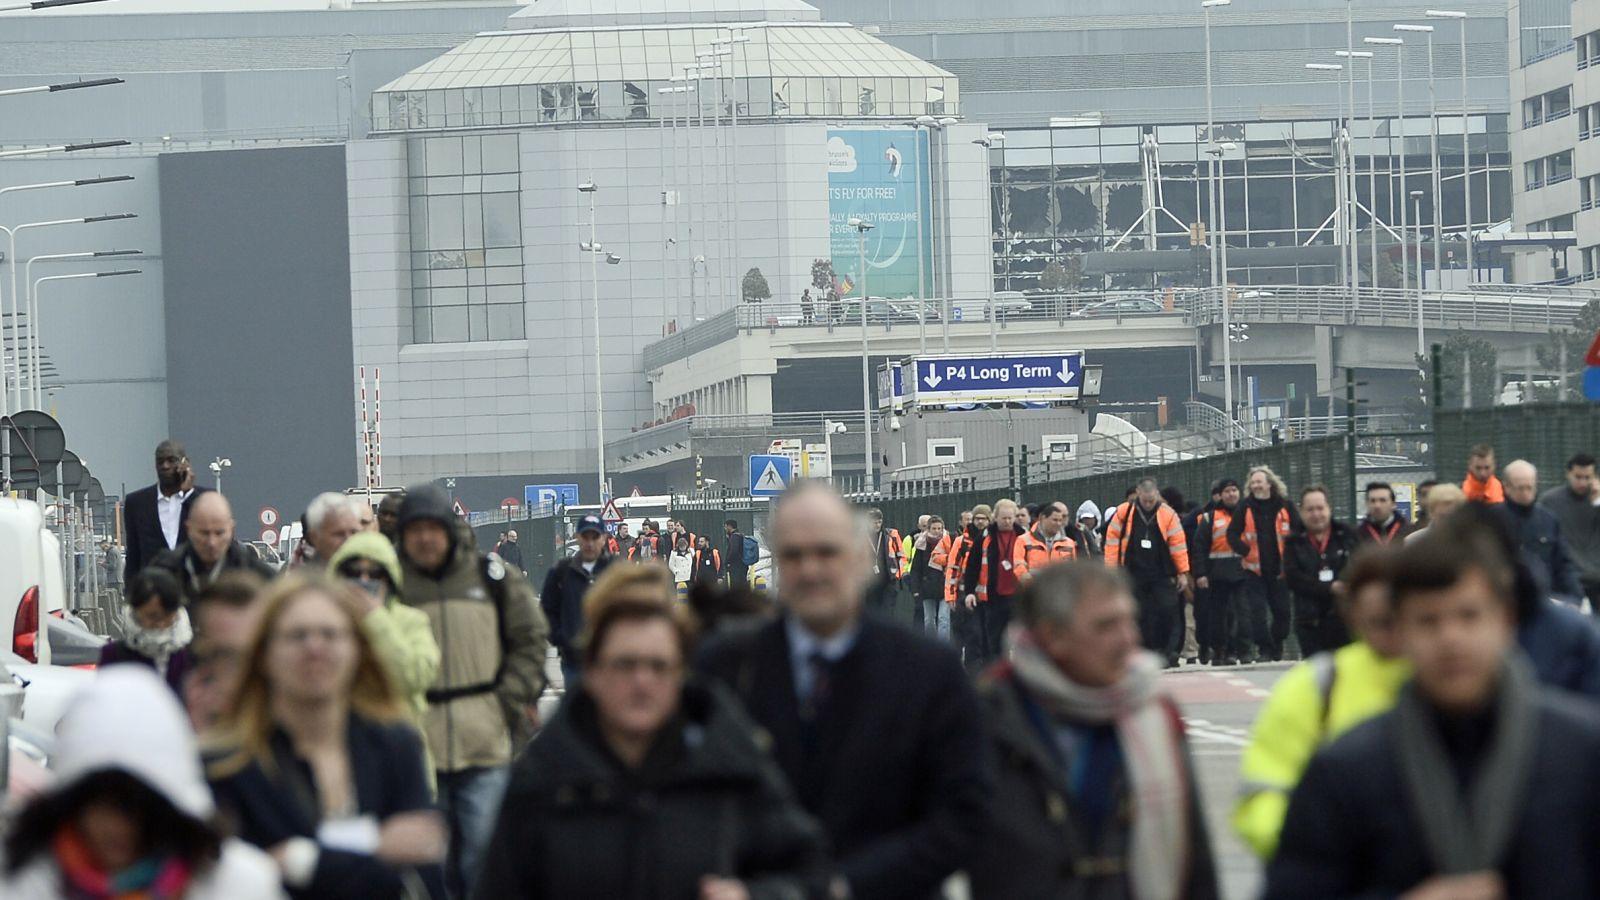 Belgium national team cancel training after Brussels attacks